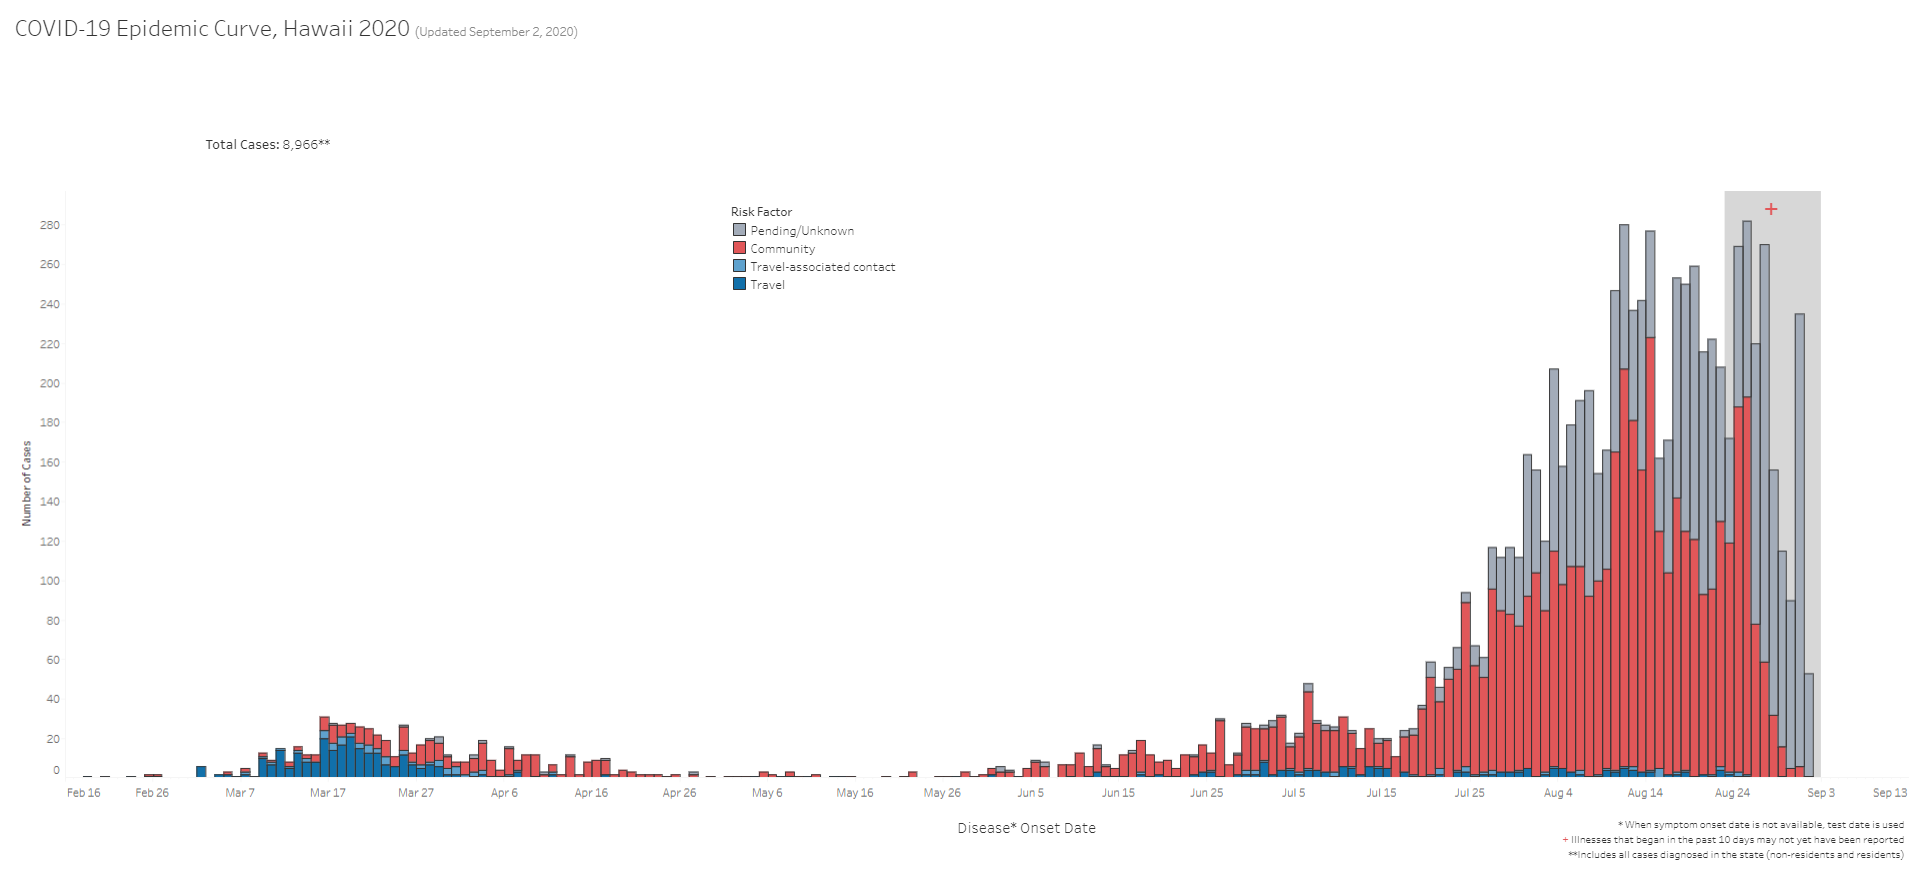 COVID-19 Epidemic Curve Hawaii September 2, 2020